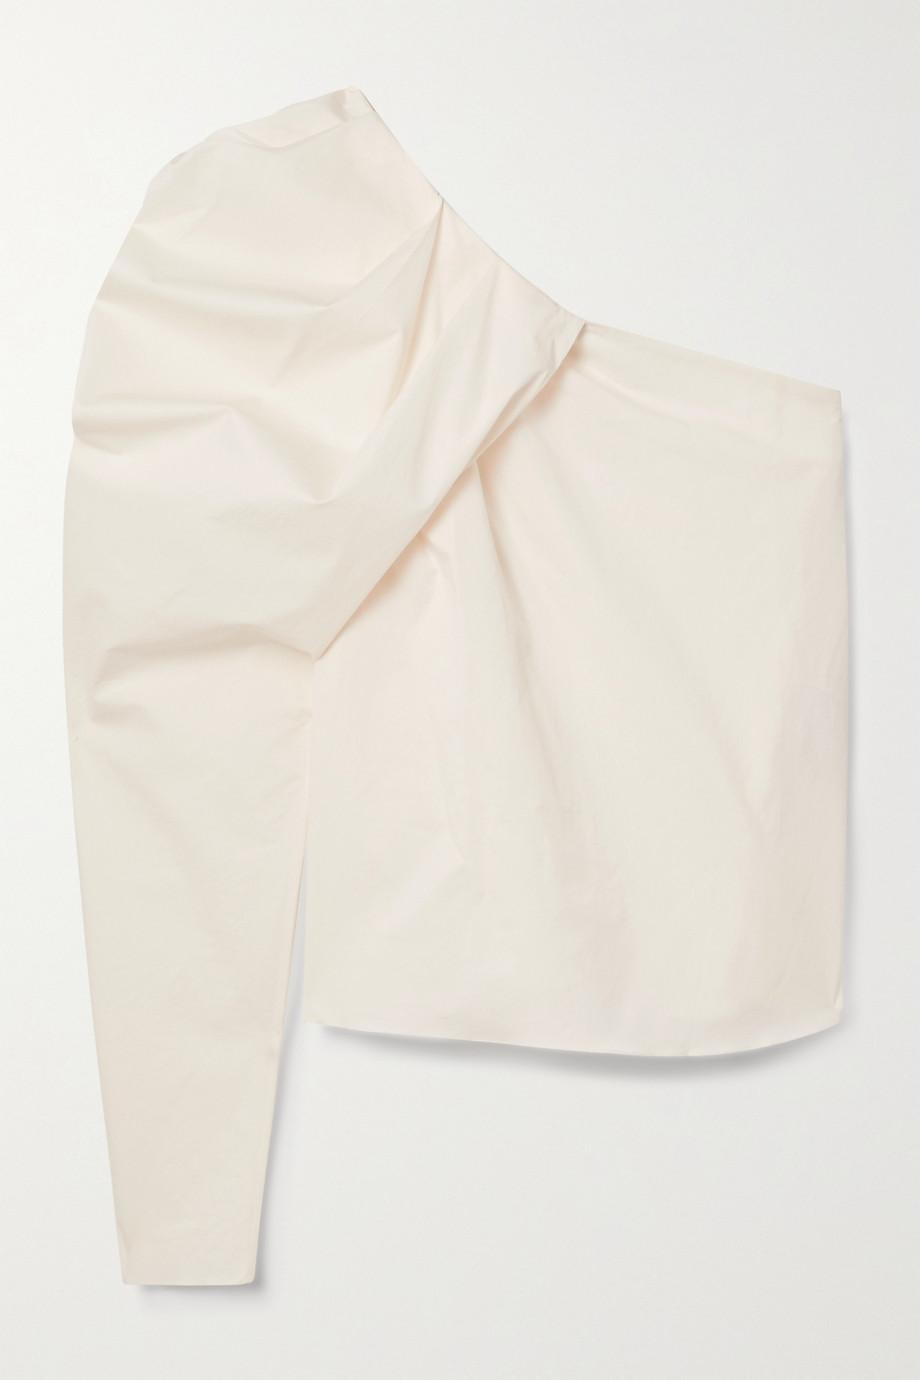 Johanna Ortiz Forgotten Promises convertible one-shoulder draped cotton-blend poplin top